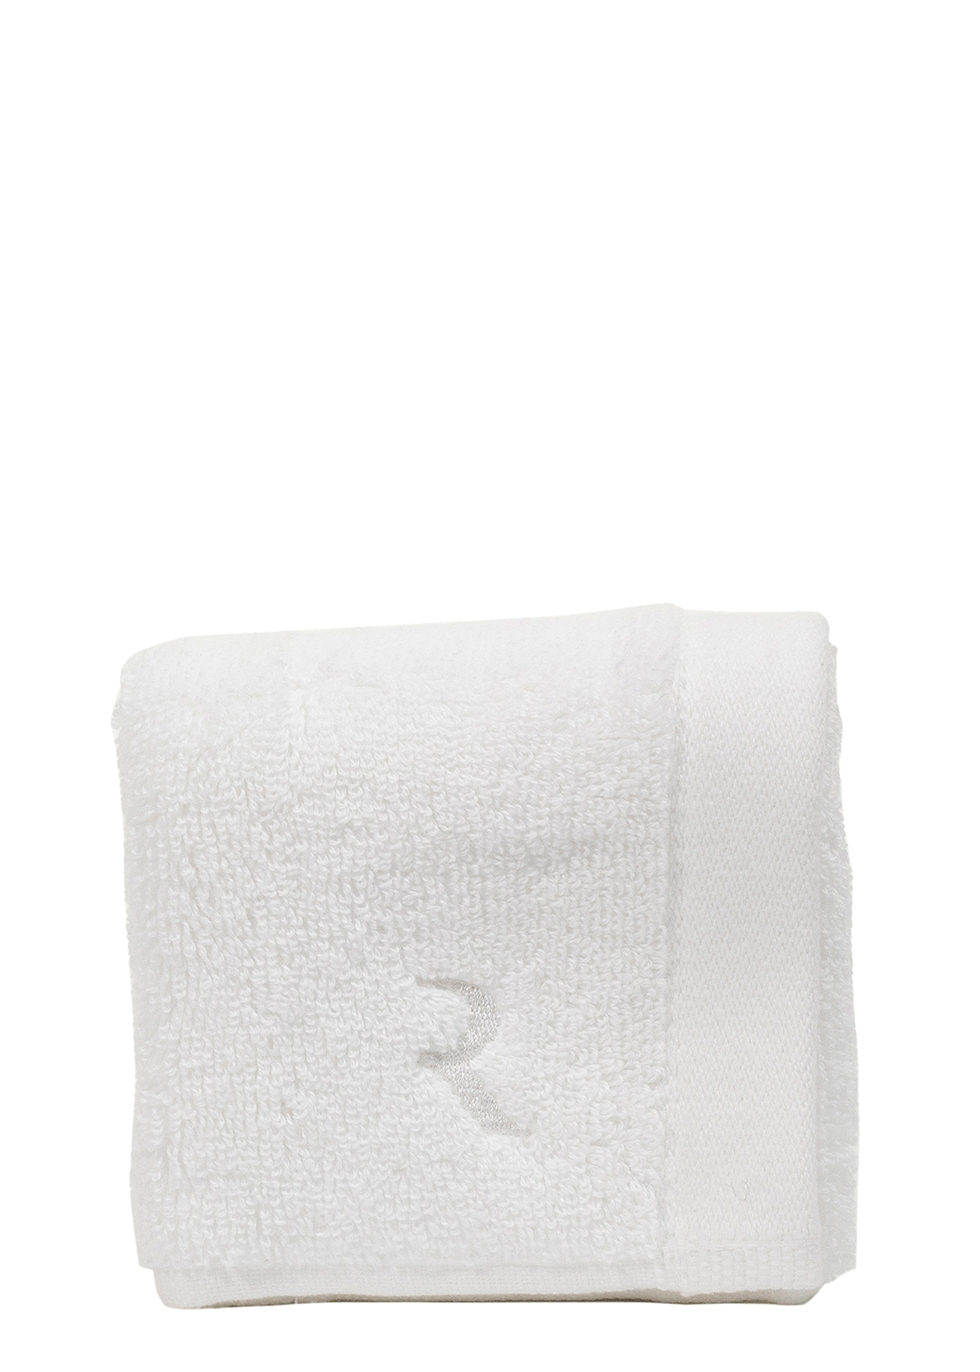 Wash Cloth Single - White